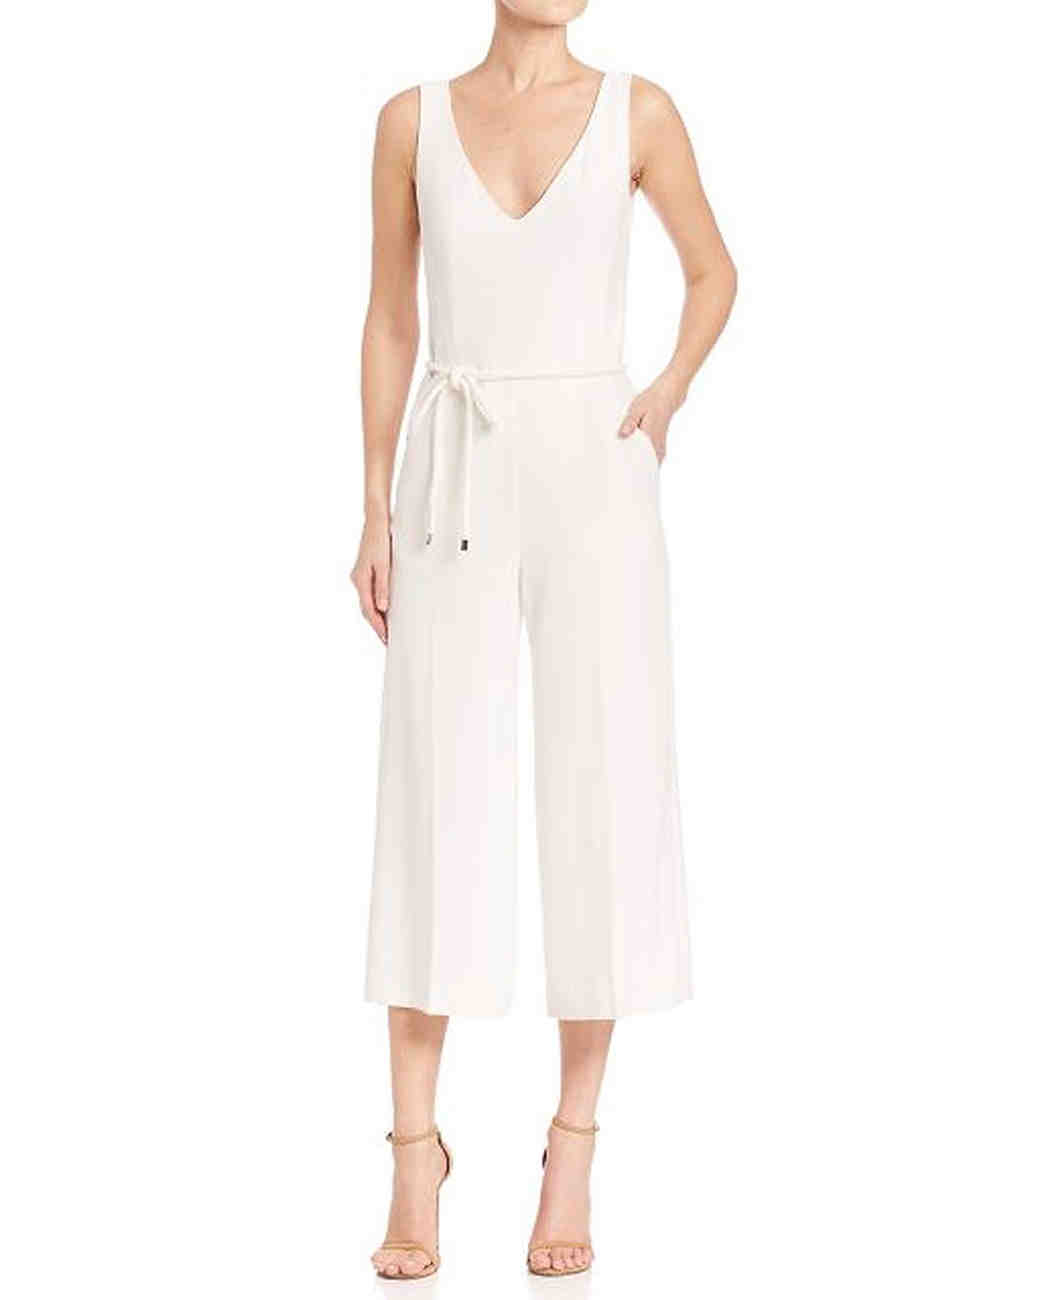 bachelorette-party-dress-trina-turk-jumpsuit-0416.jpg